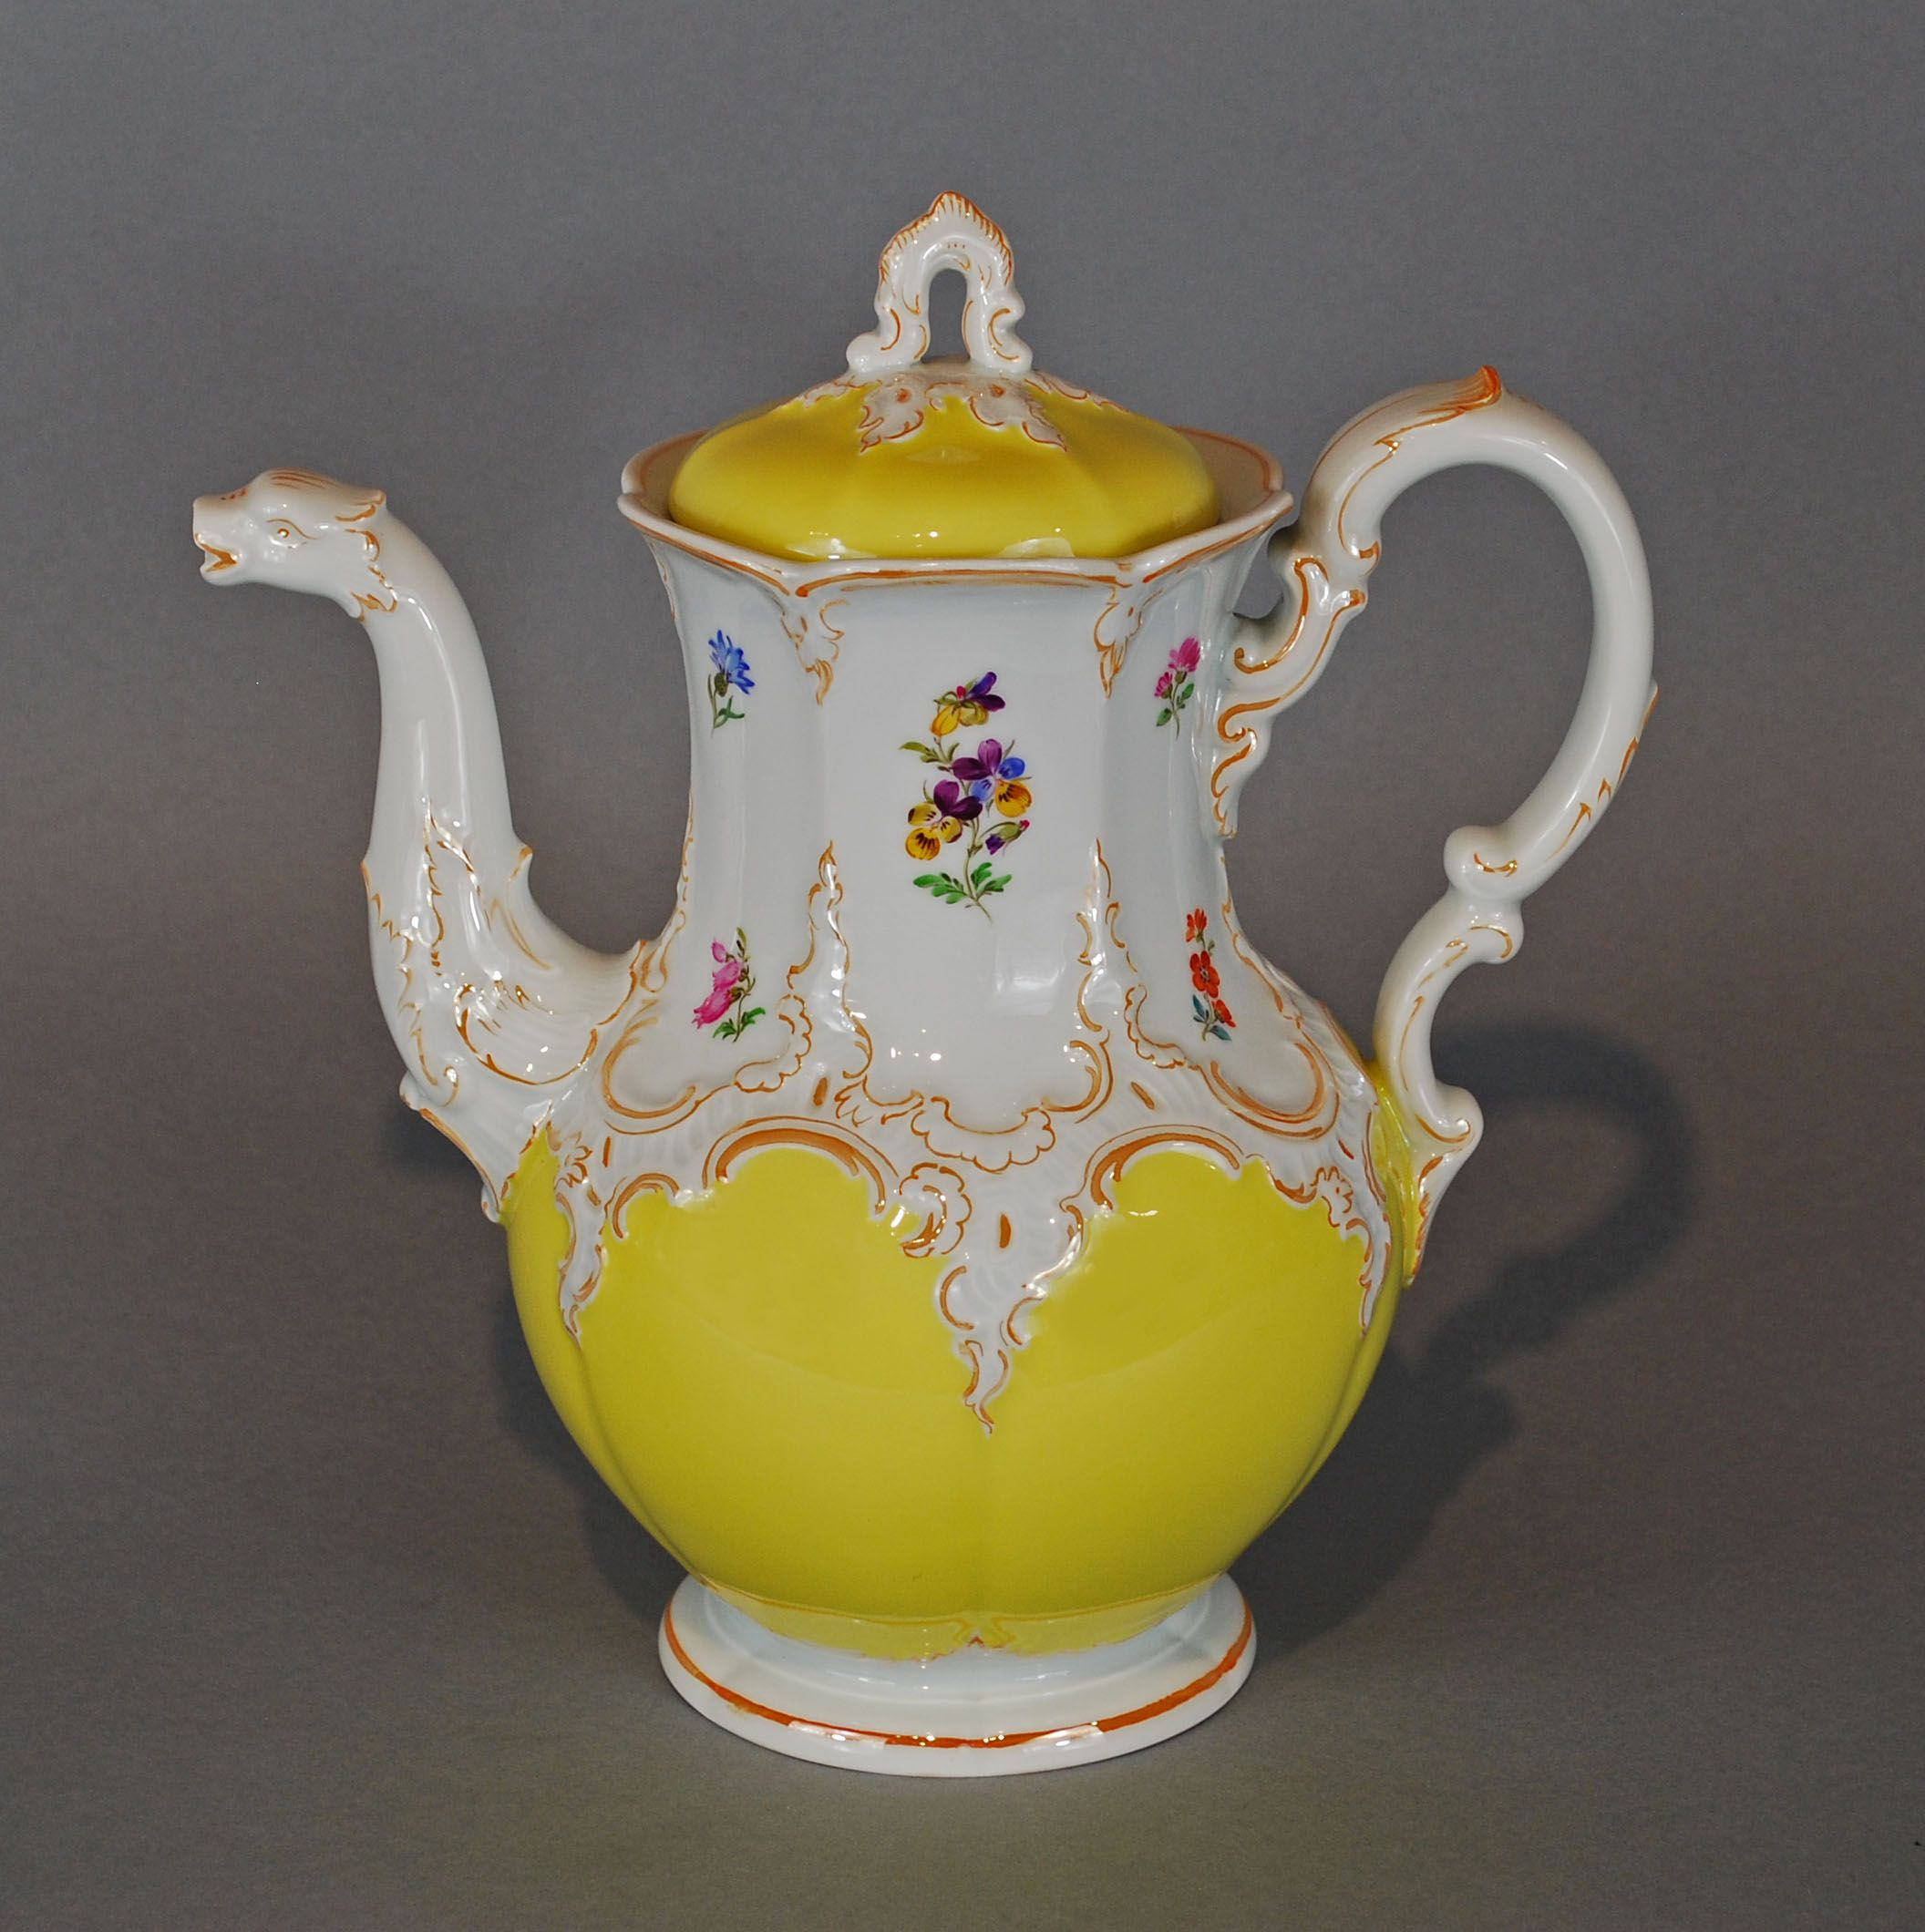 Meissen Porcelain Vintage Yellow Large Coffee Tea Pot with Flowers